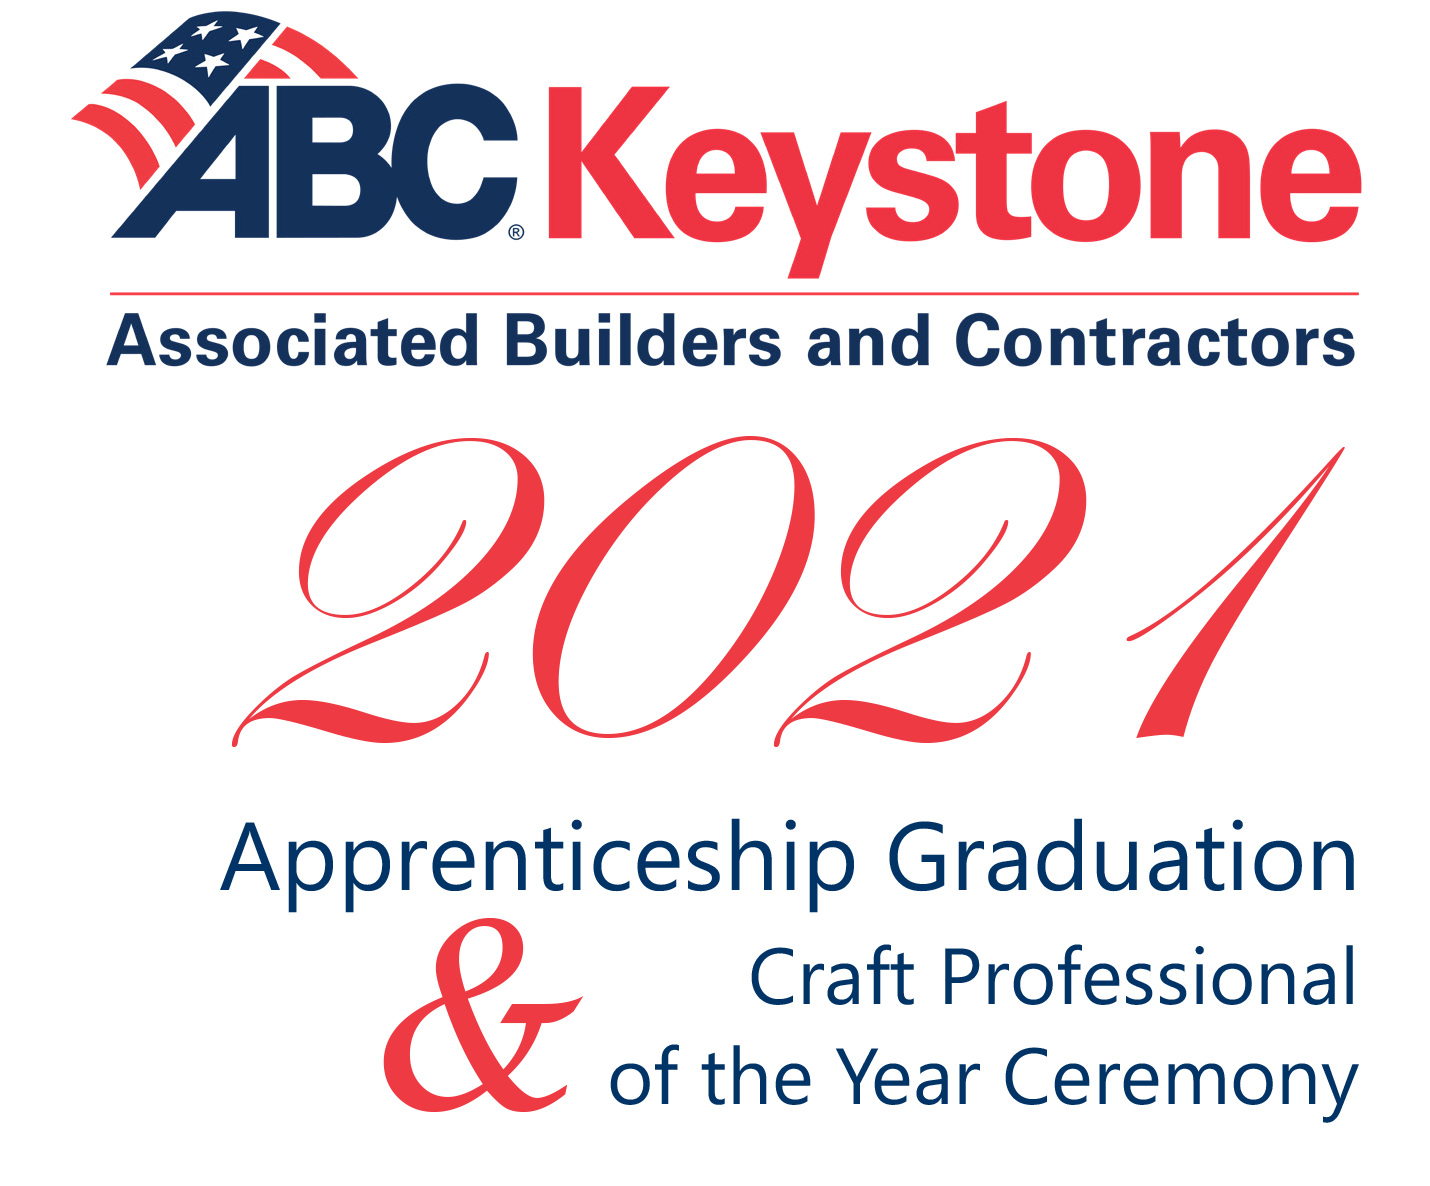 2021 Graduation Logo ABC Keystone